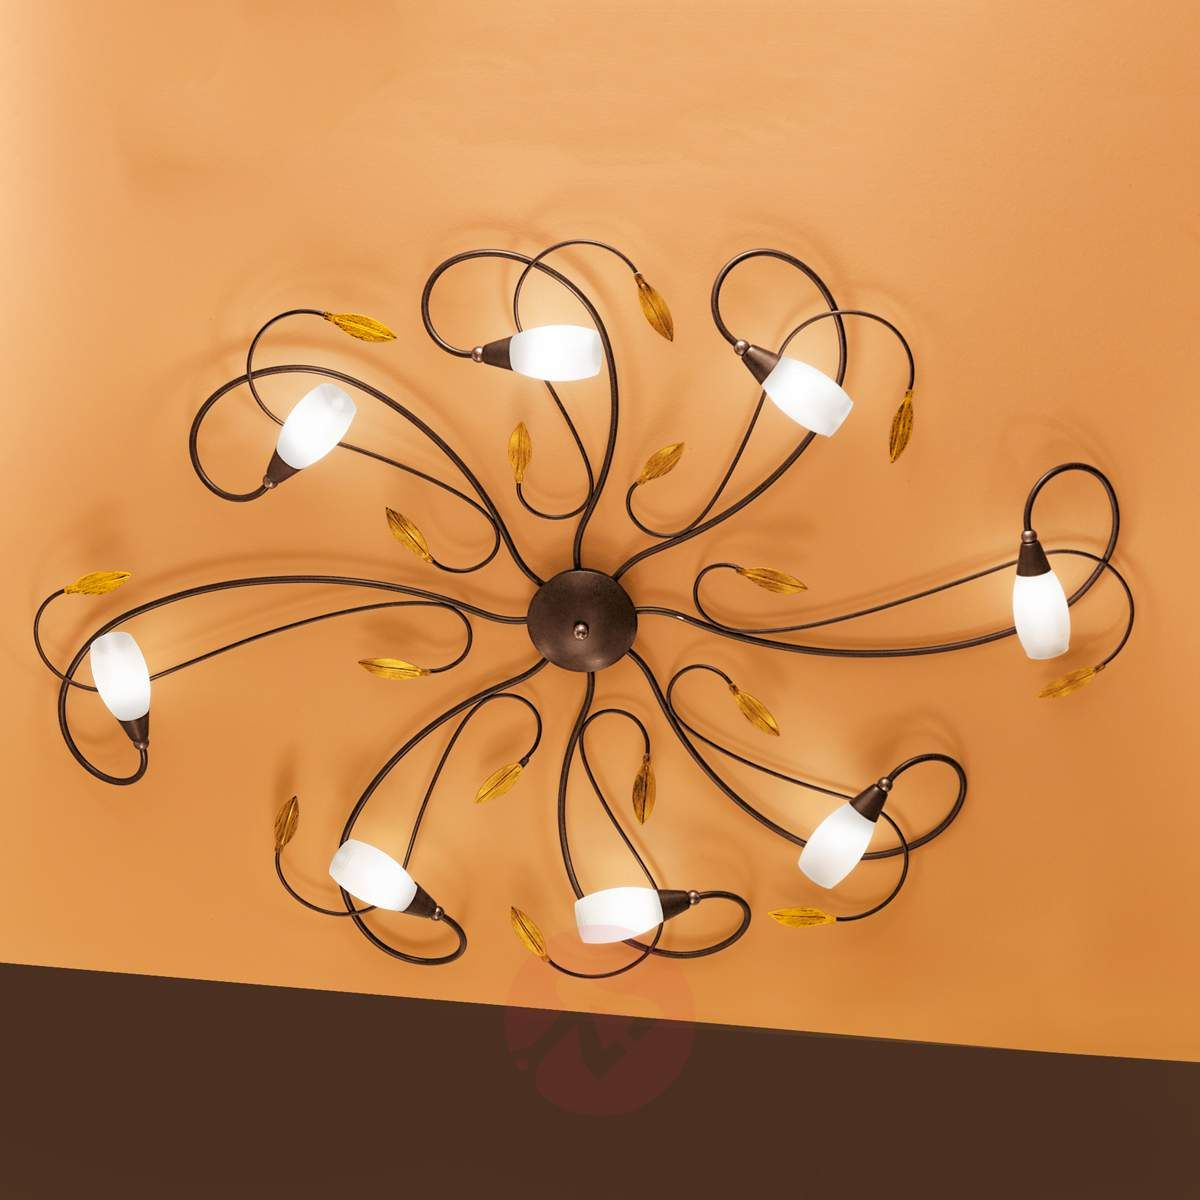 Fantazyjna Lampa Sufitowa Gerbera 8 Punktowa W 2019 Lampy